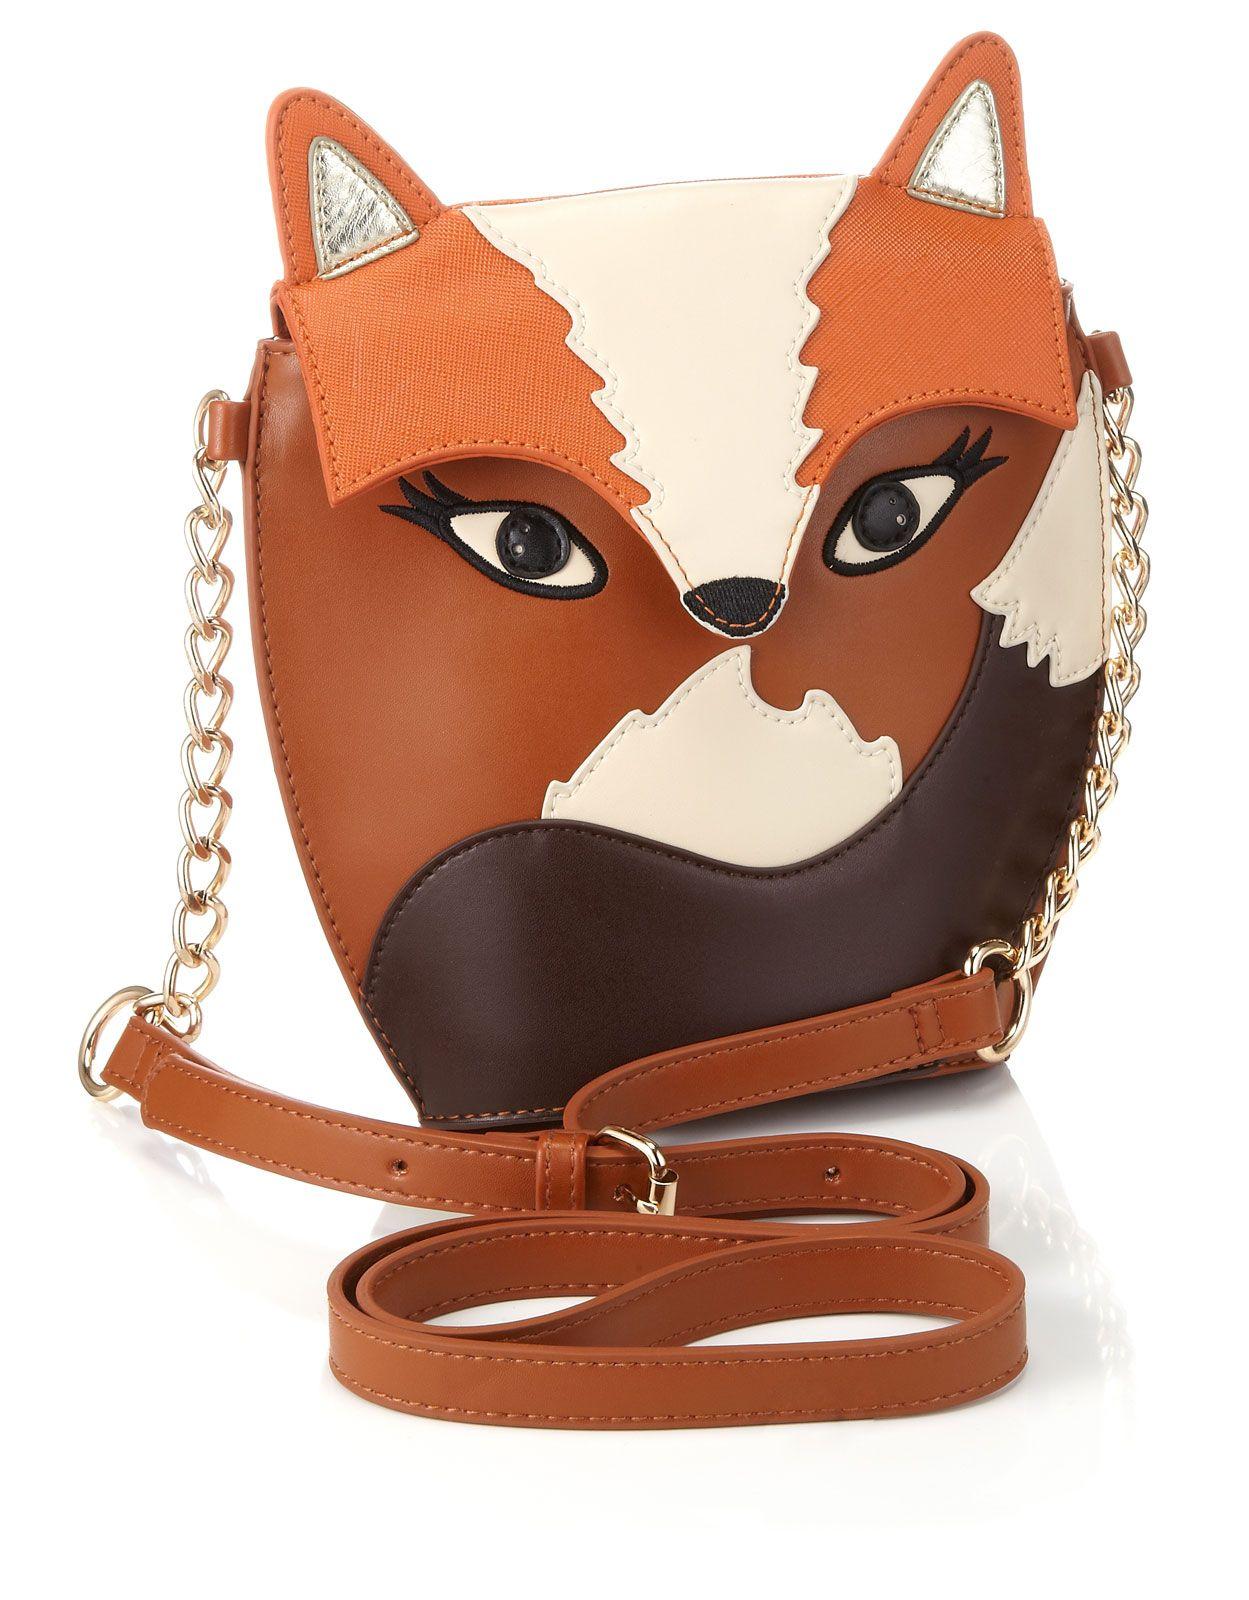 4d768564b28 Mr. Fox bag :) #accessorize | Accesories | Fox bag, Bags ...